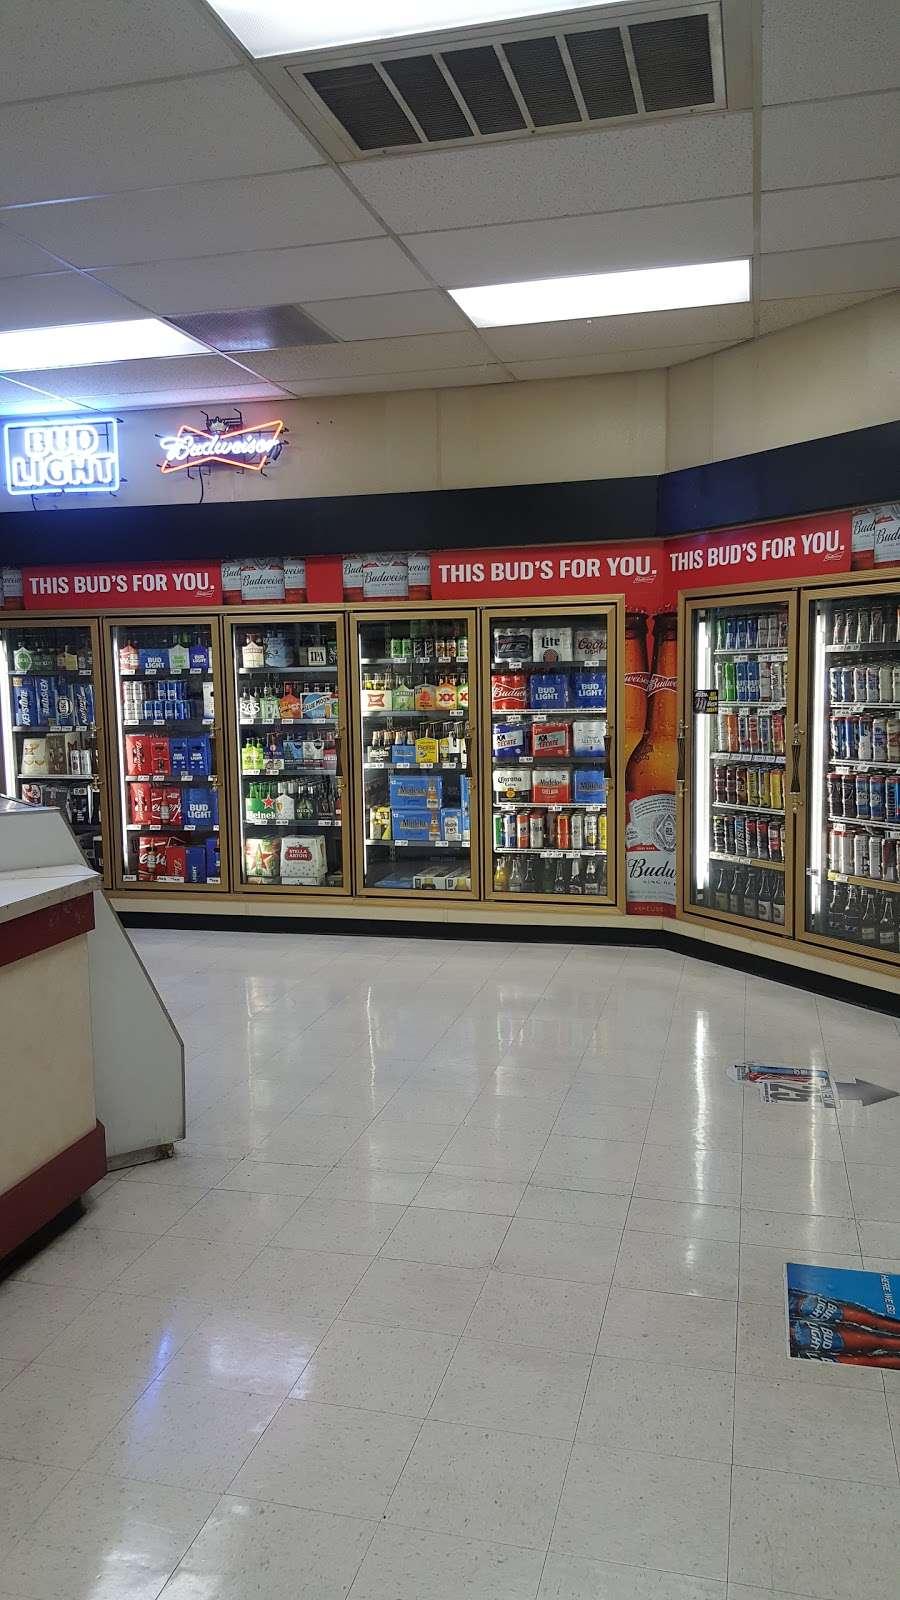 LUCKY MINI MARKET - store    Photo 6 of 9   Address: 2934 Lake East Dr, Las Vegas, NV 89117, USA   Phone: (702) 517-9969